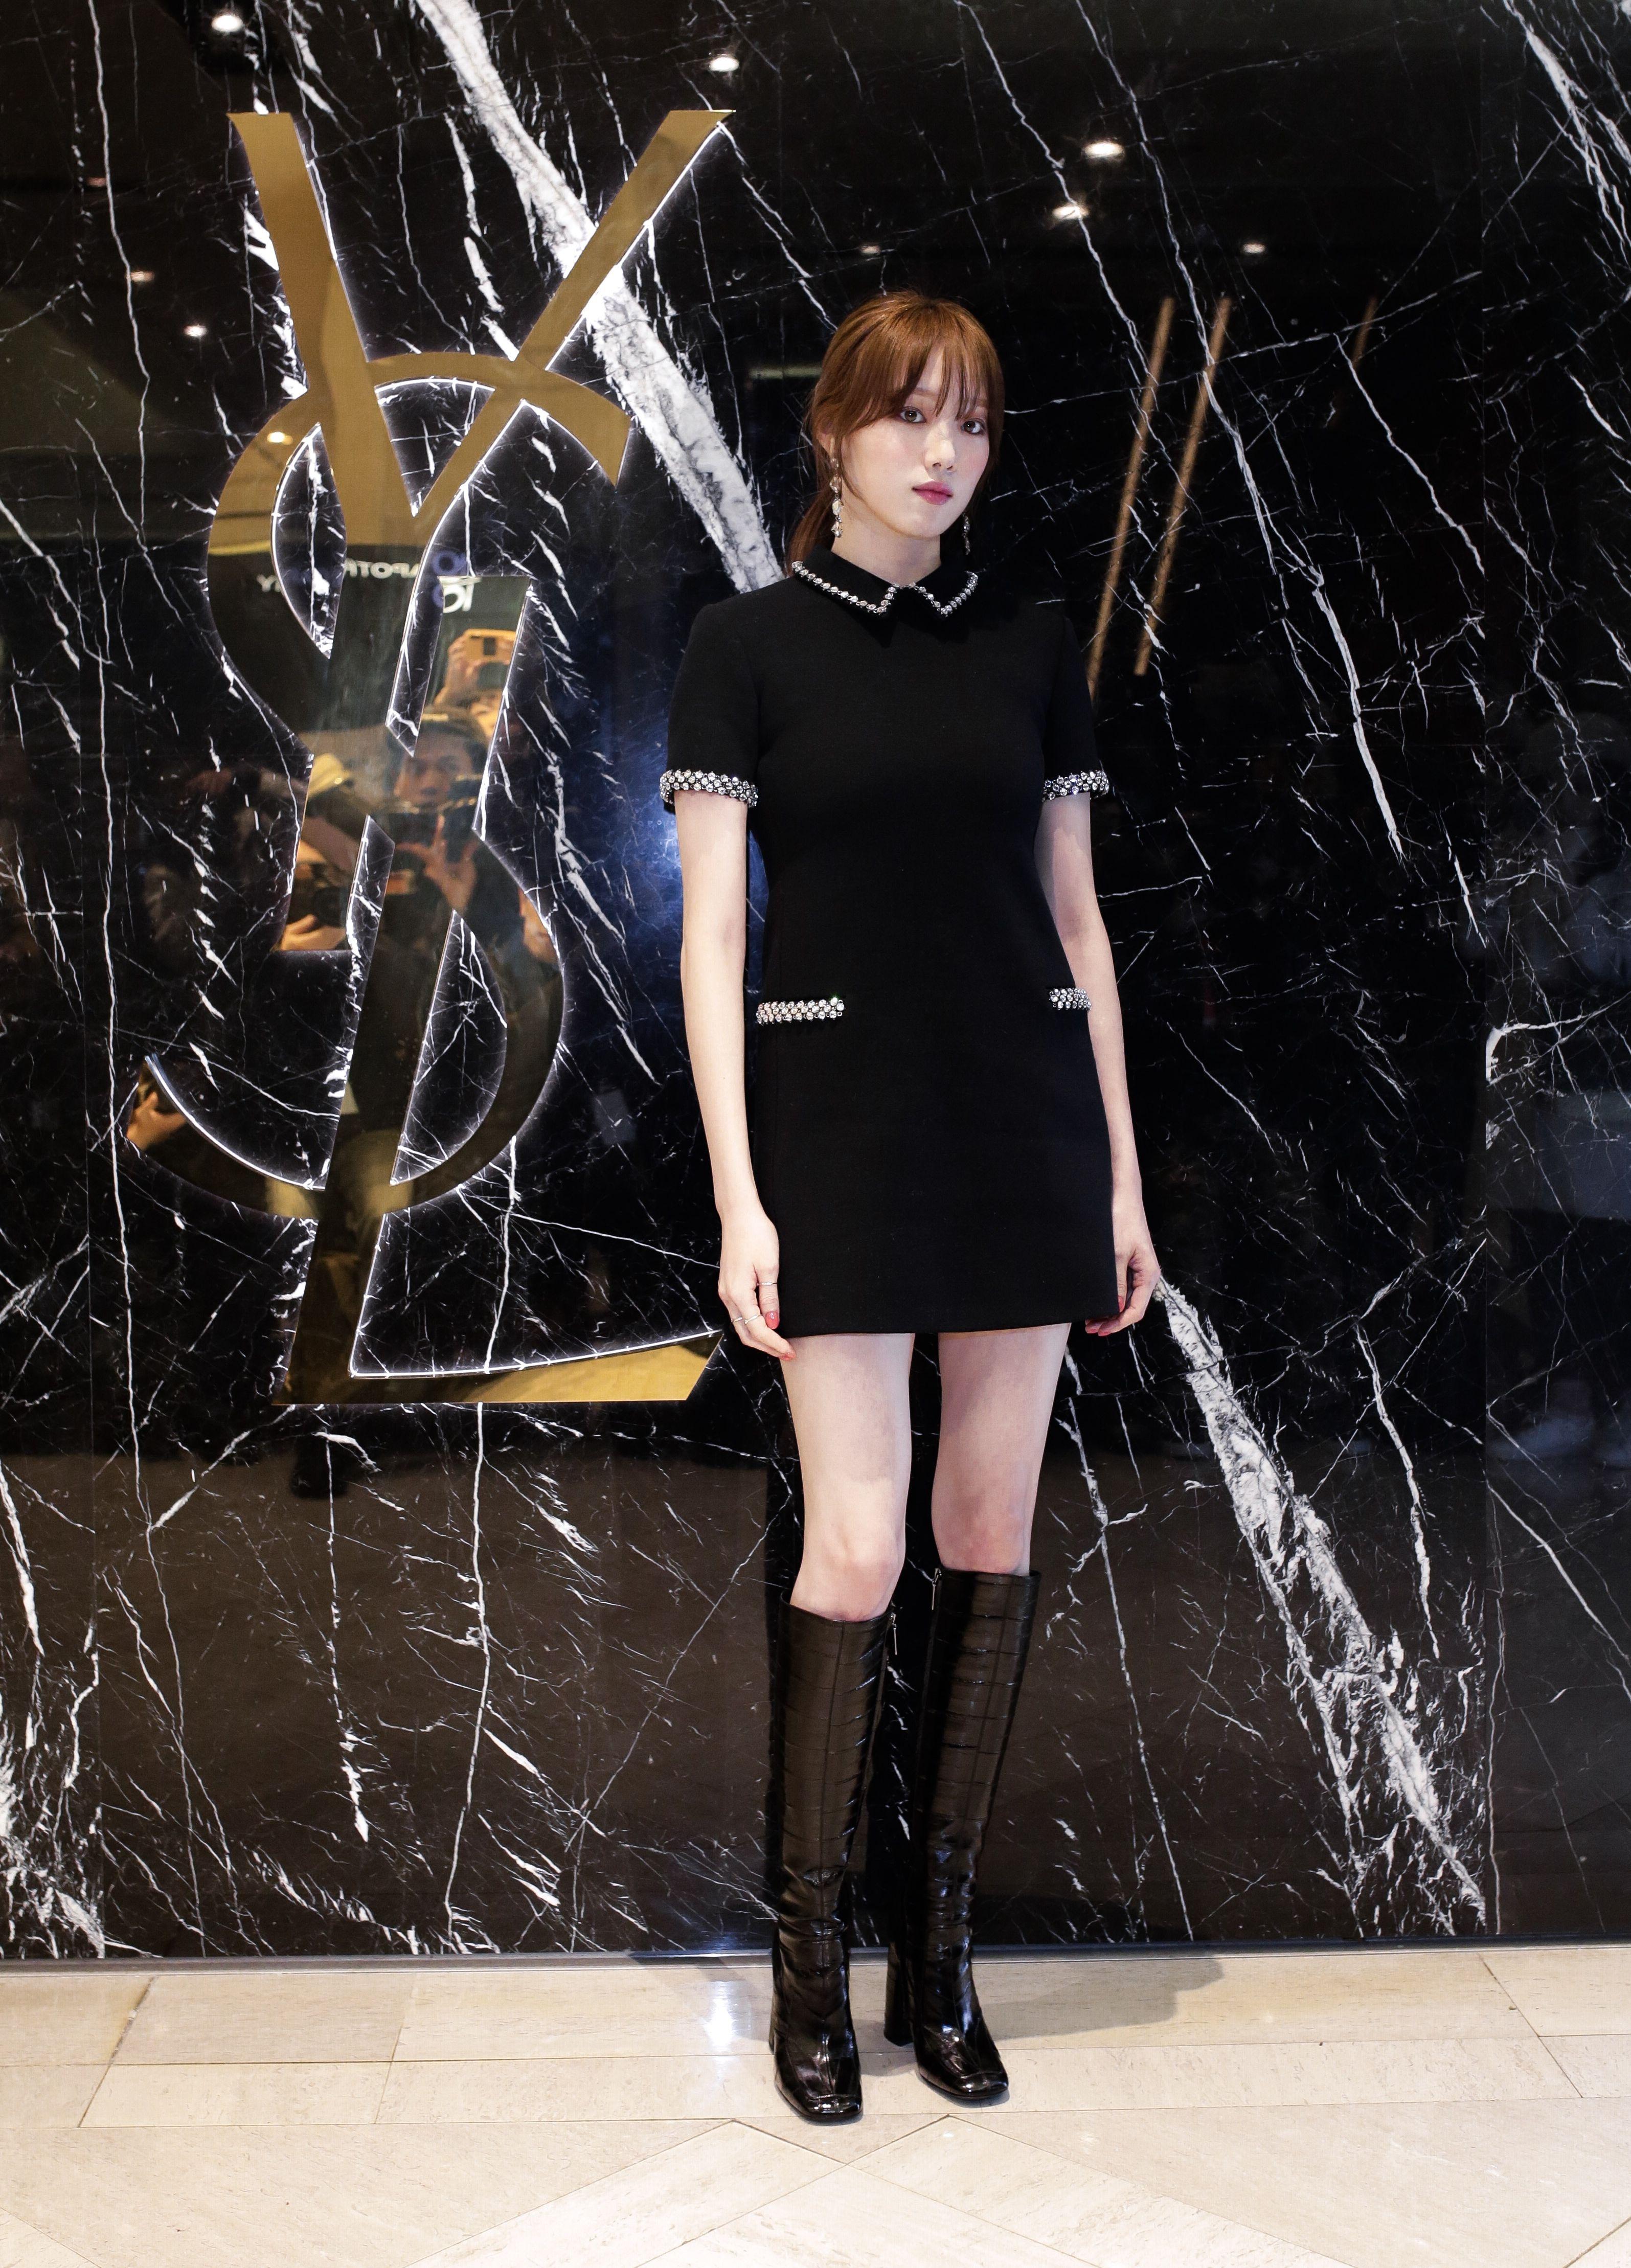 ootd, 女星穿搭, 穿搭筆記 李聖經, 穿搭, 韓星穿搭, 顯瘦穿搭, 時尚穿搭,Saint Laurent ,台灣,台北